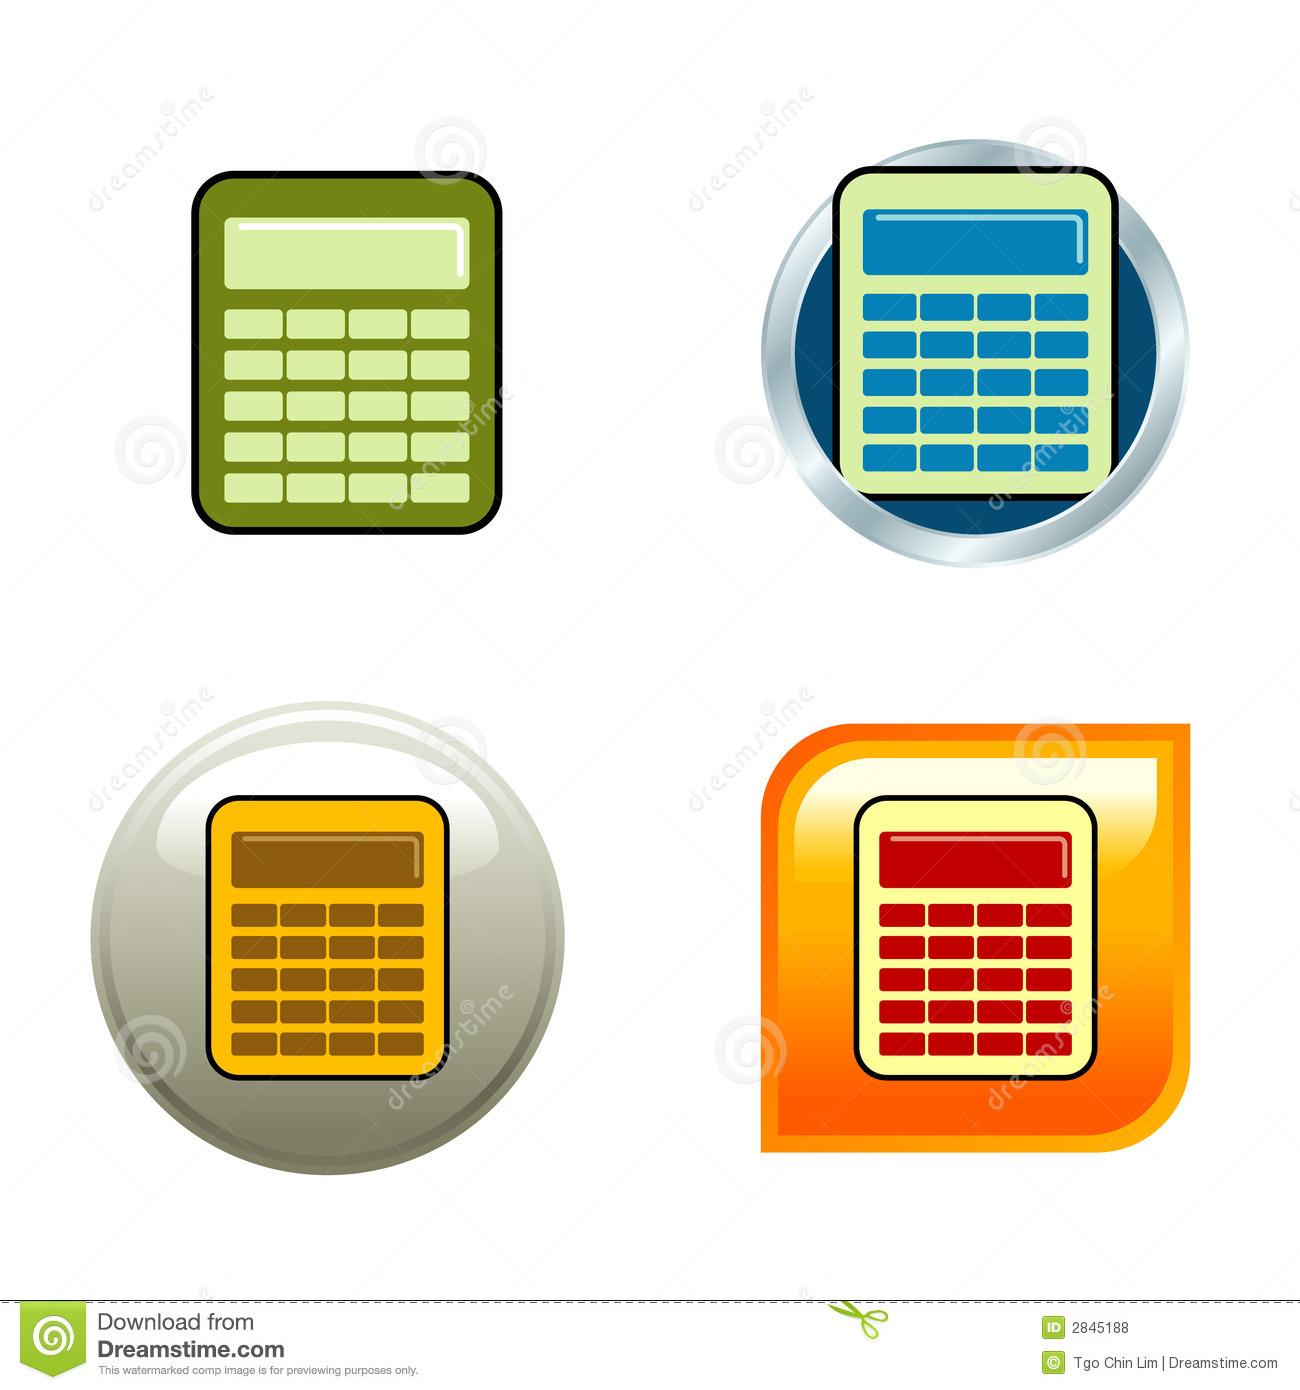 7 Free Calculator Icon Images - Windows Calculator Icon, Windows